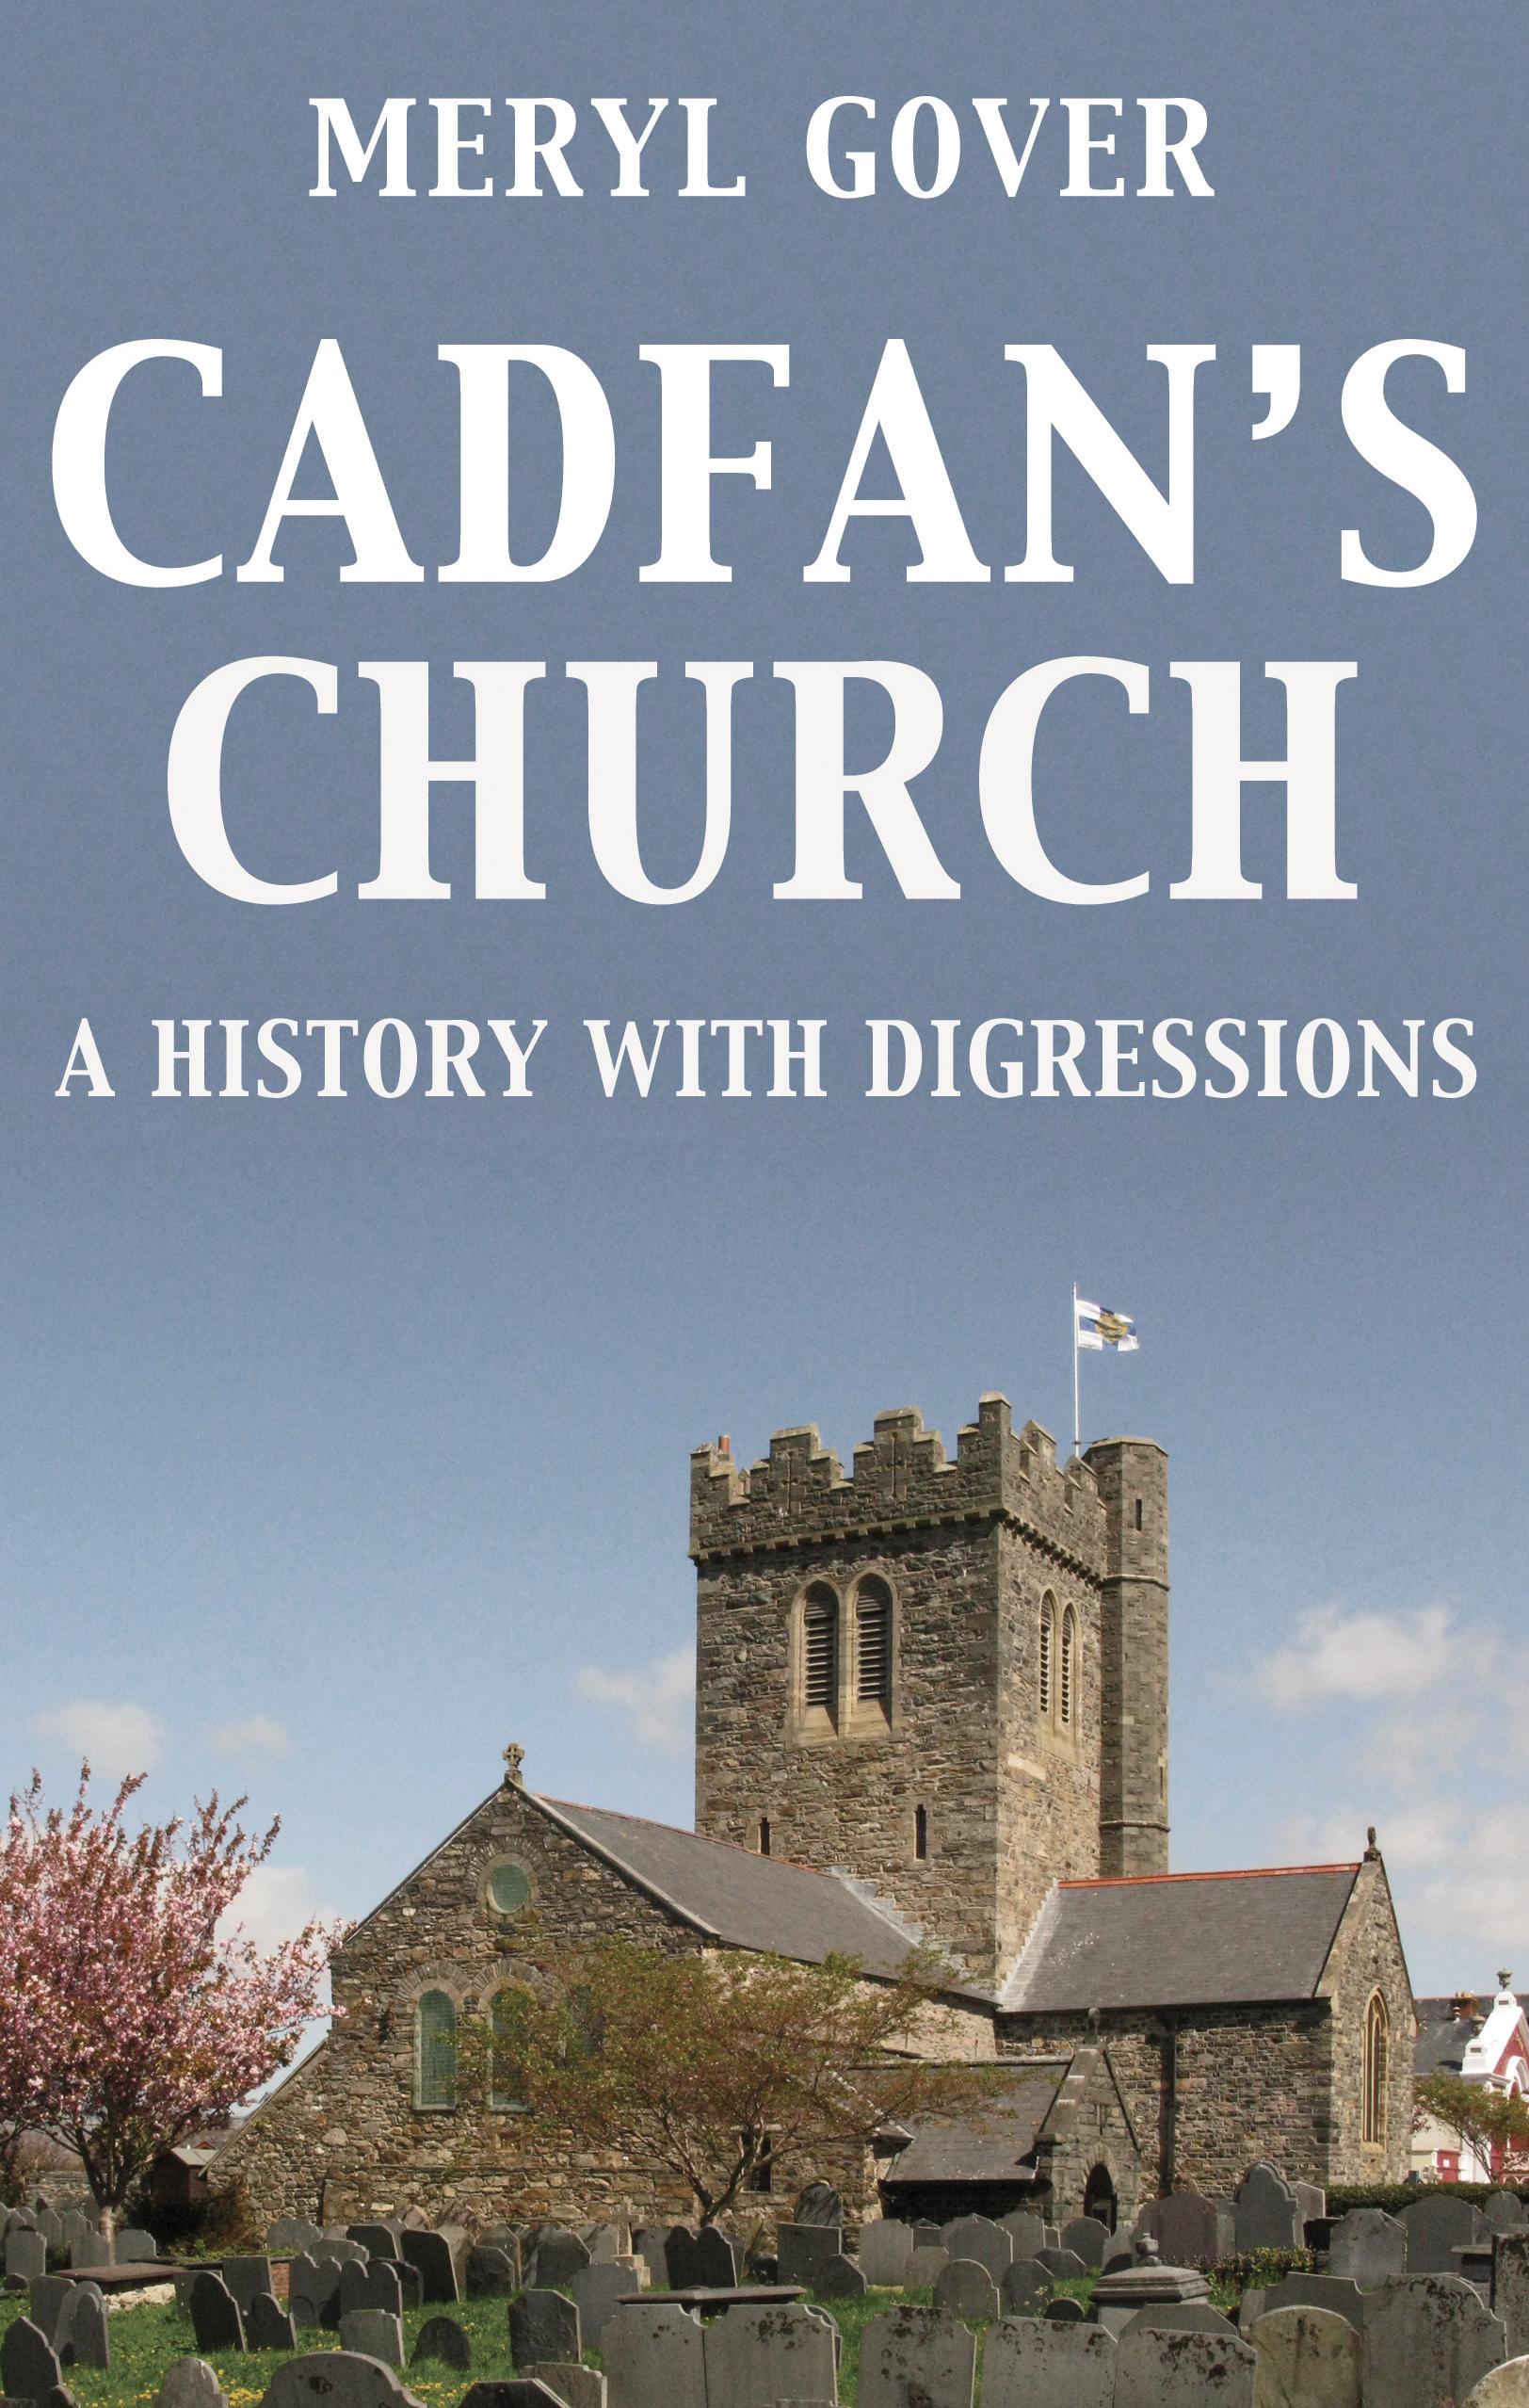 Cadfans Church Meryl Gover